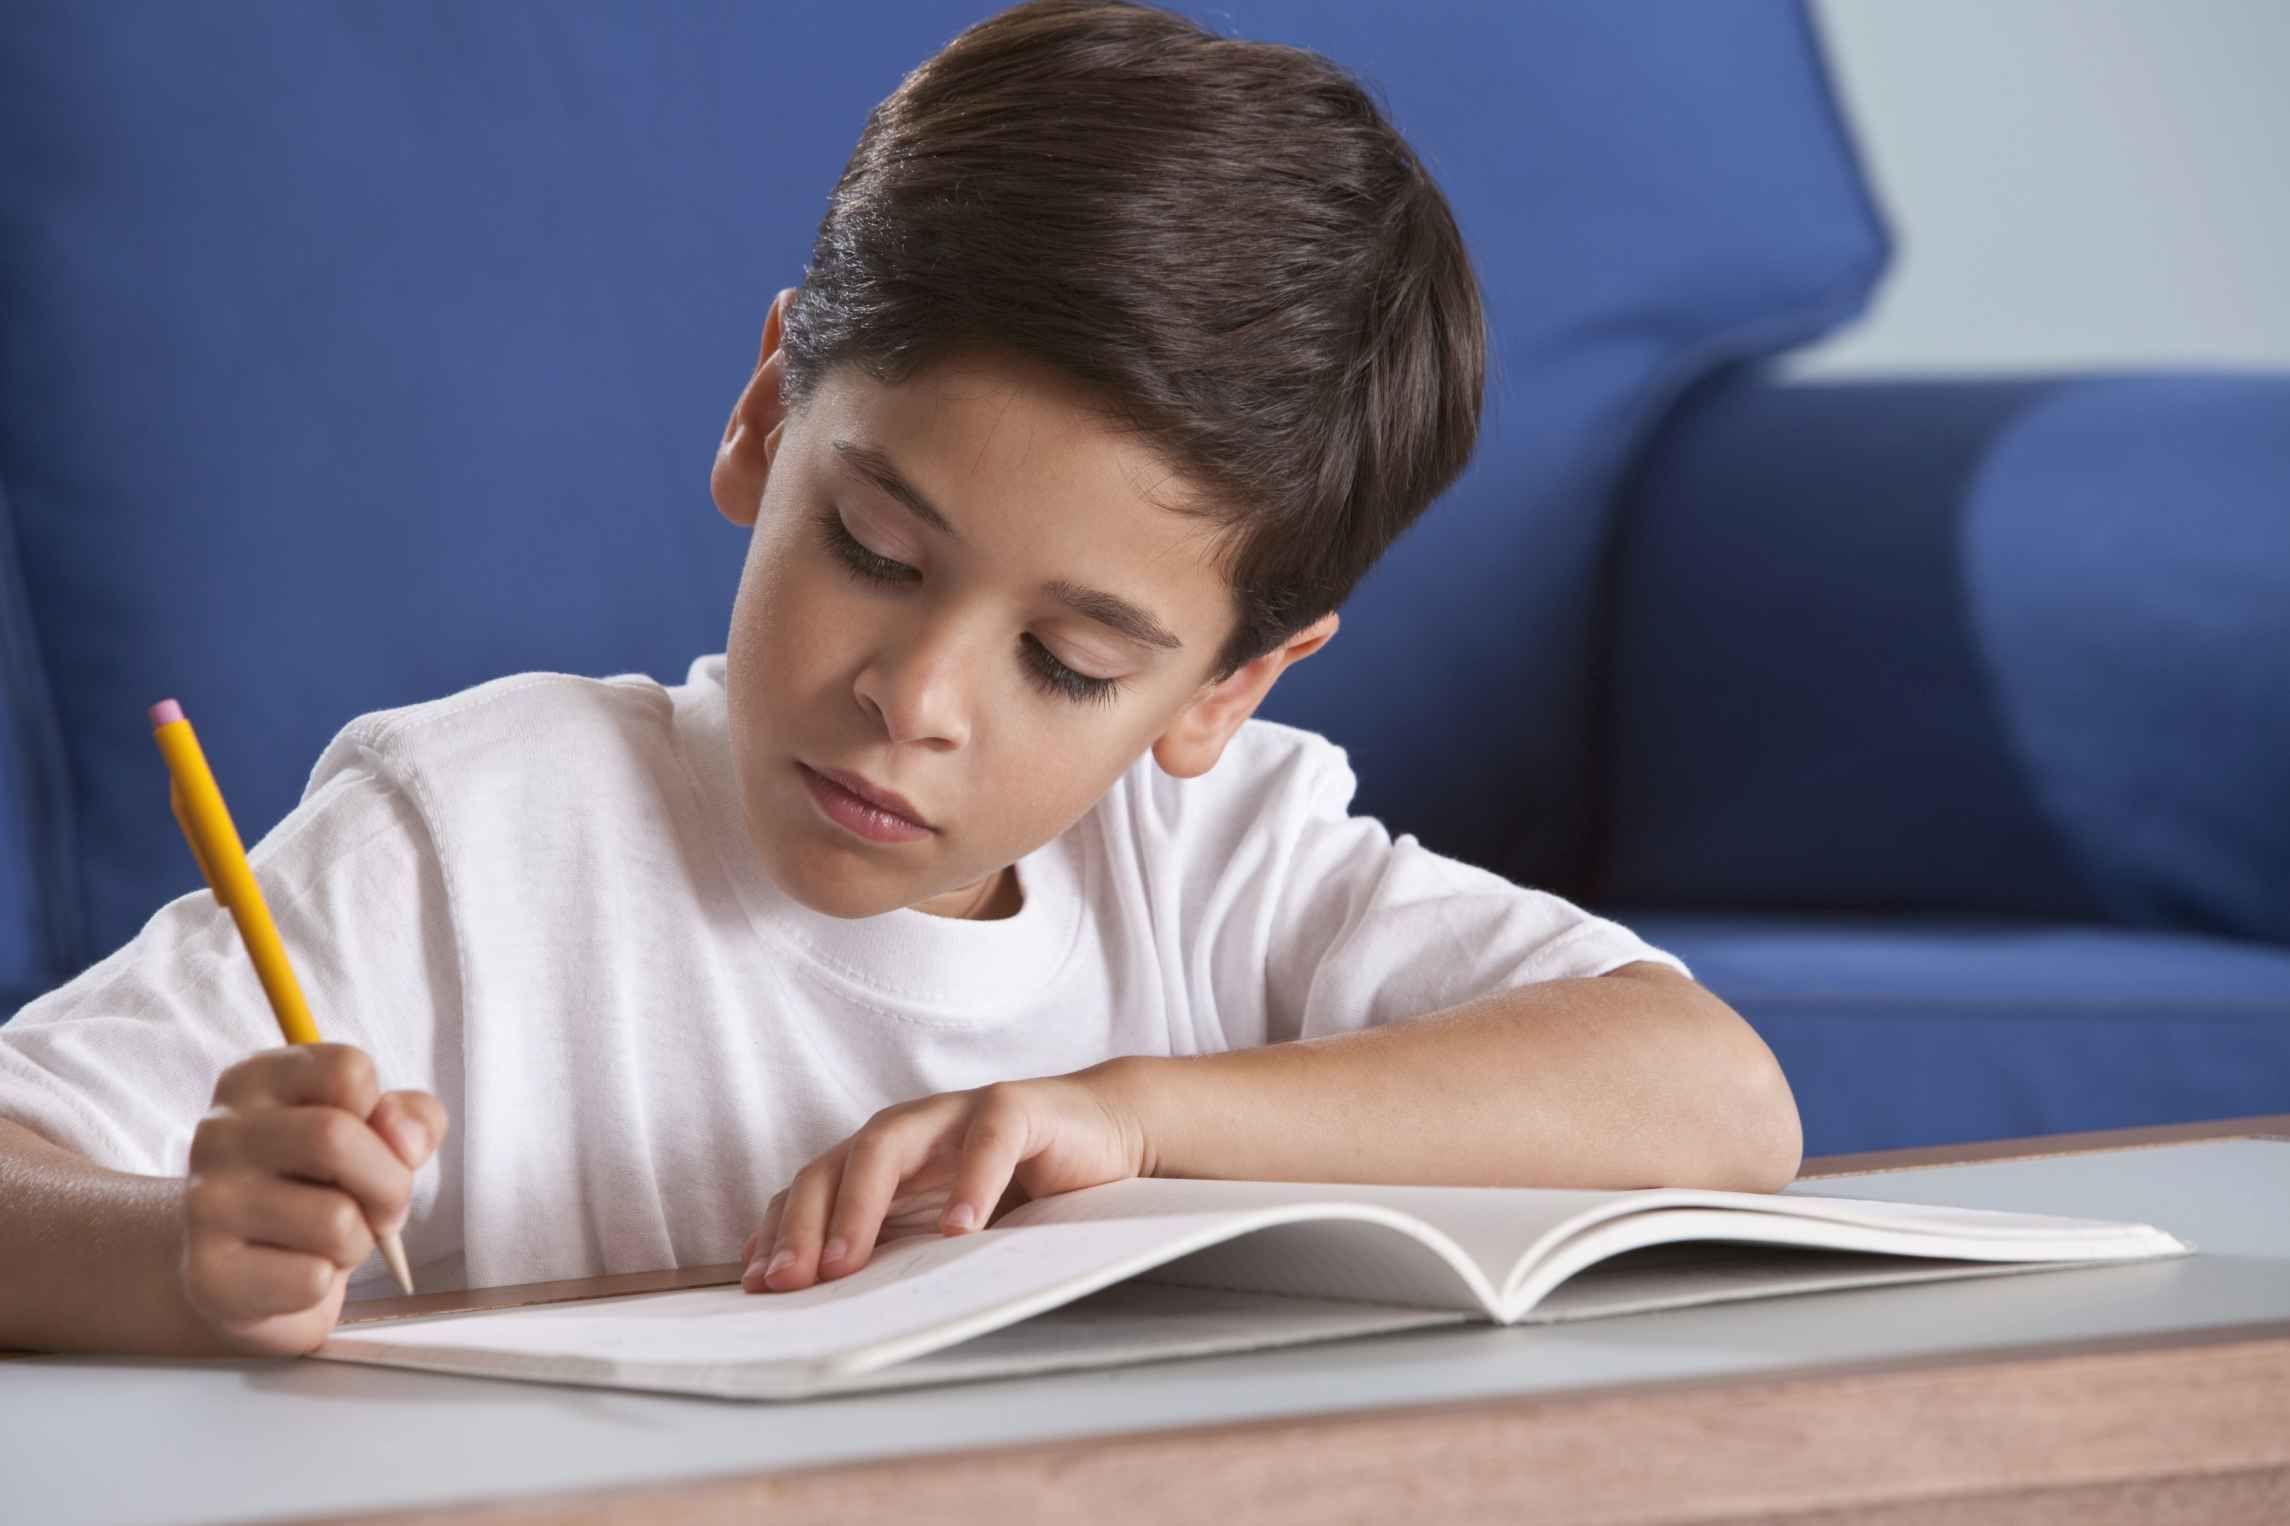 How to Improve Children's Writing Speed Speed writing